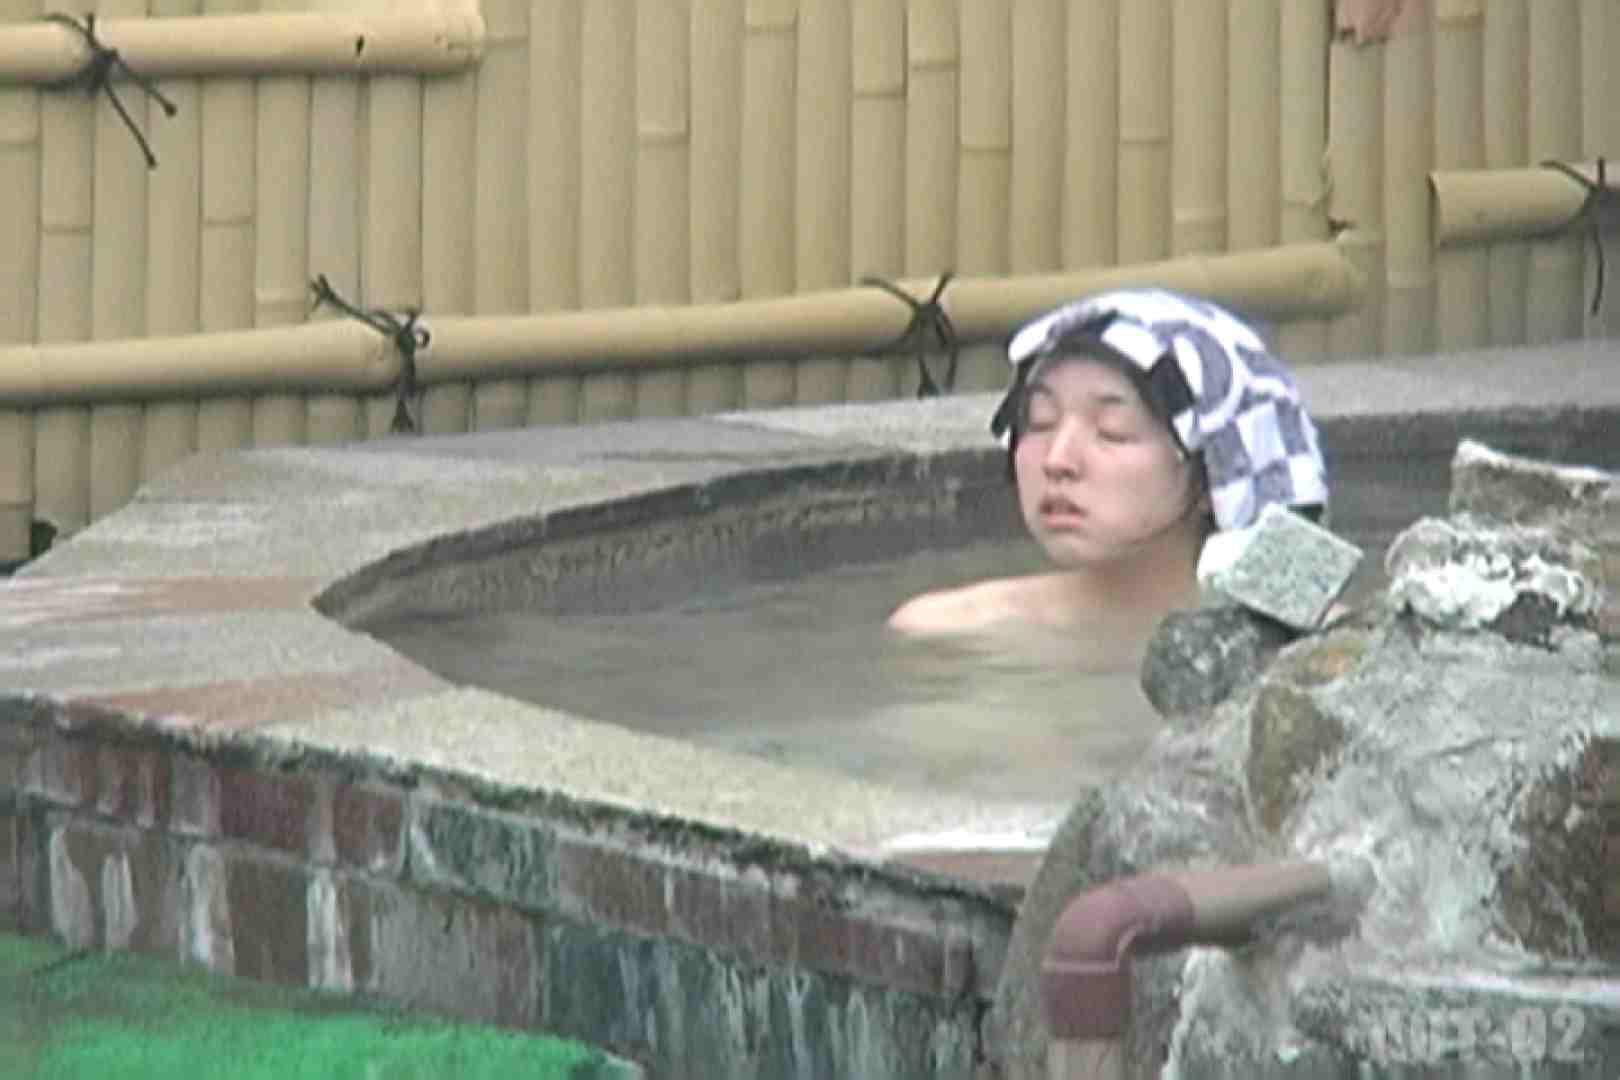 Aquaな露天風呂Vol.723 盗撮シリーズ | 露天風呂編  102PIX 1